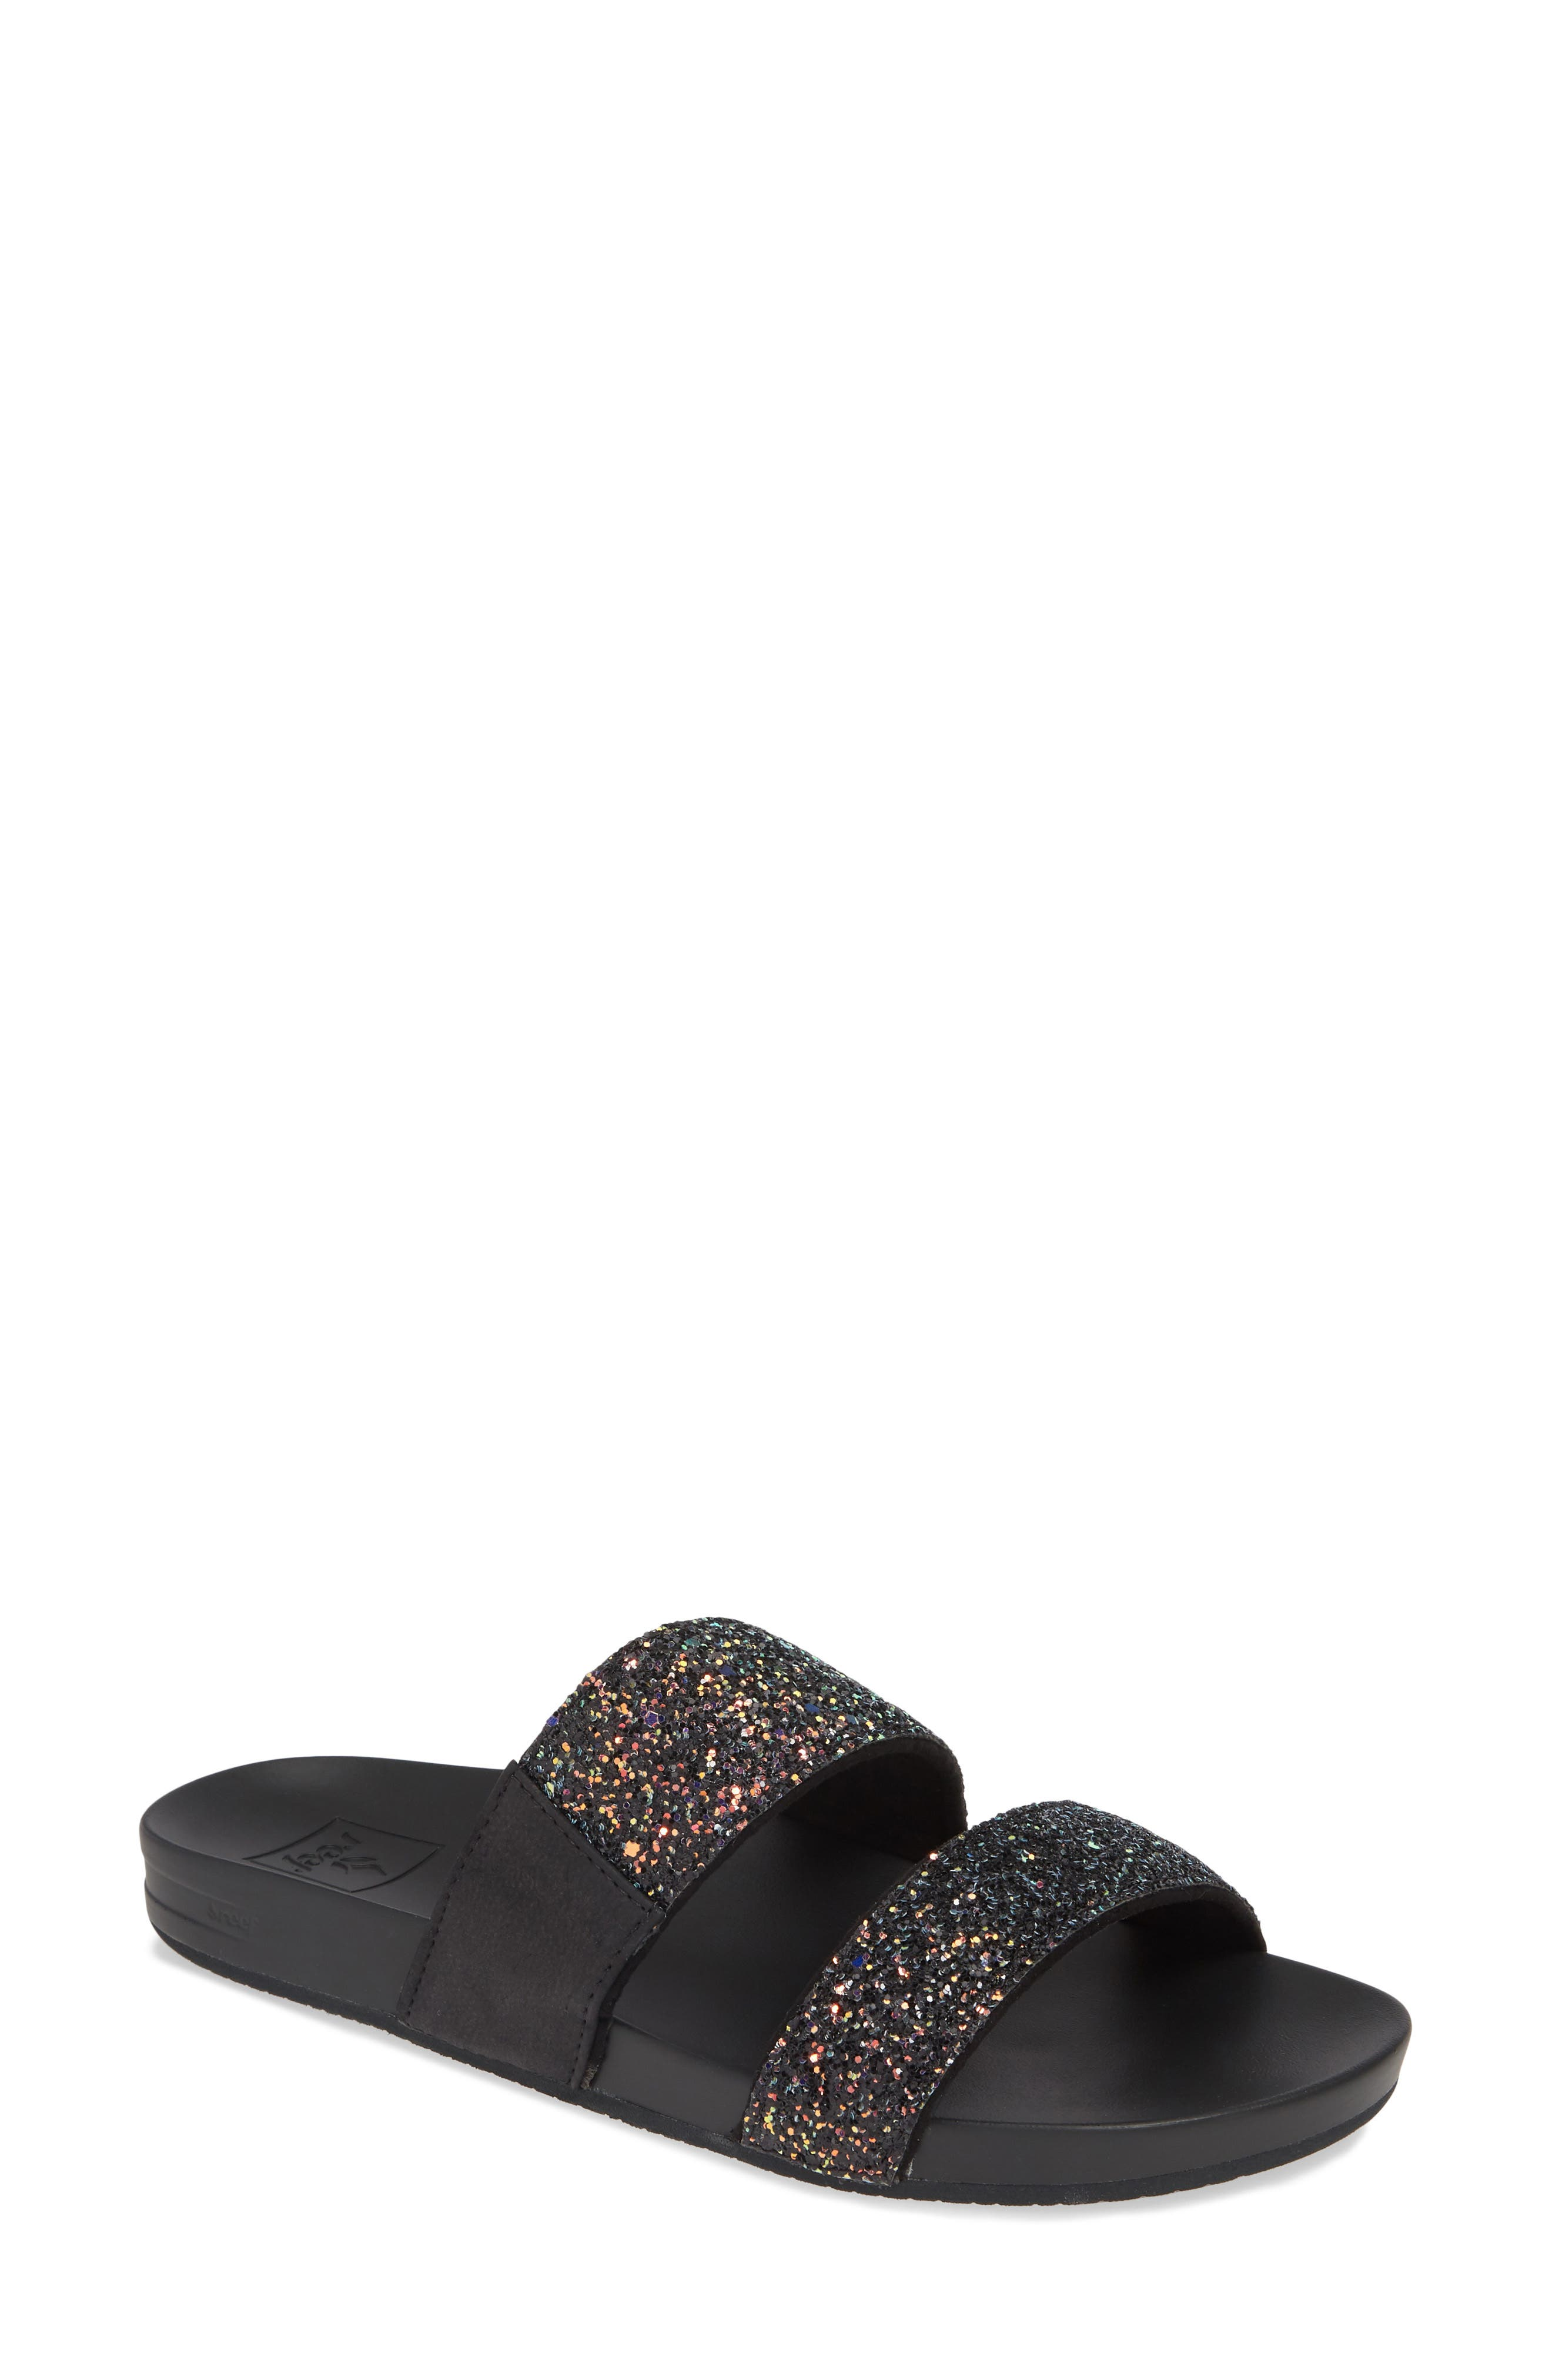 REEF, Cushion Bounce Vista Slide Sandal, Main thumbnail 1, color, POP ROCKS